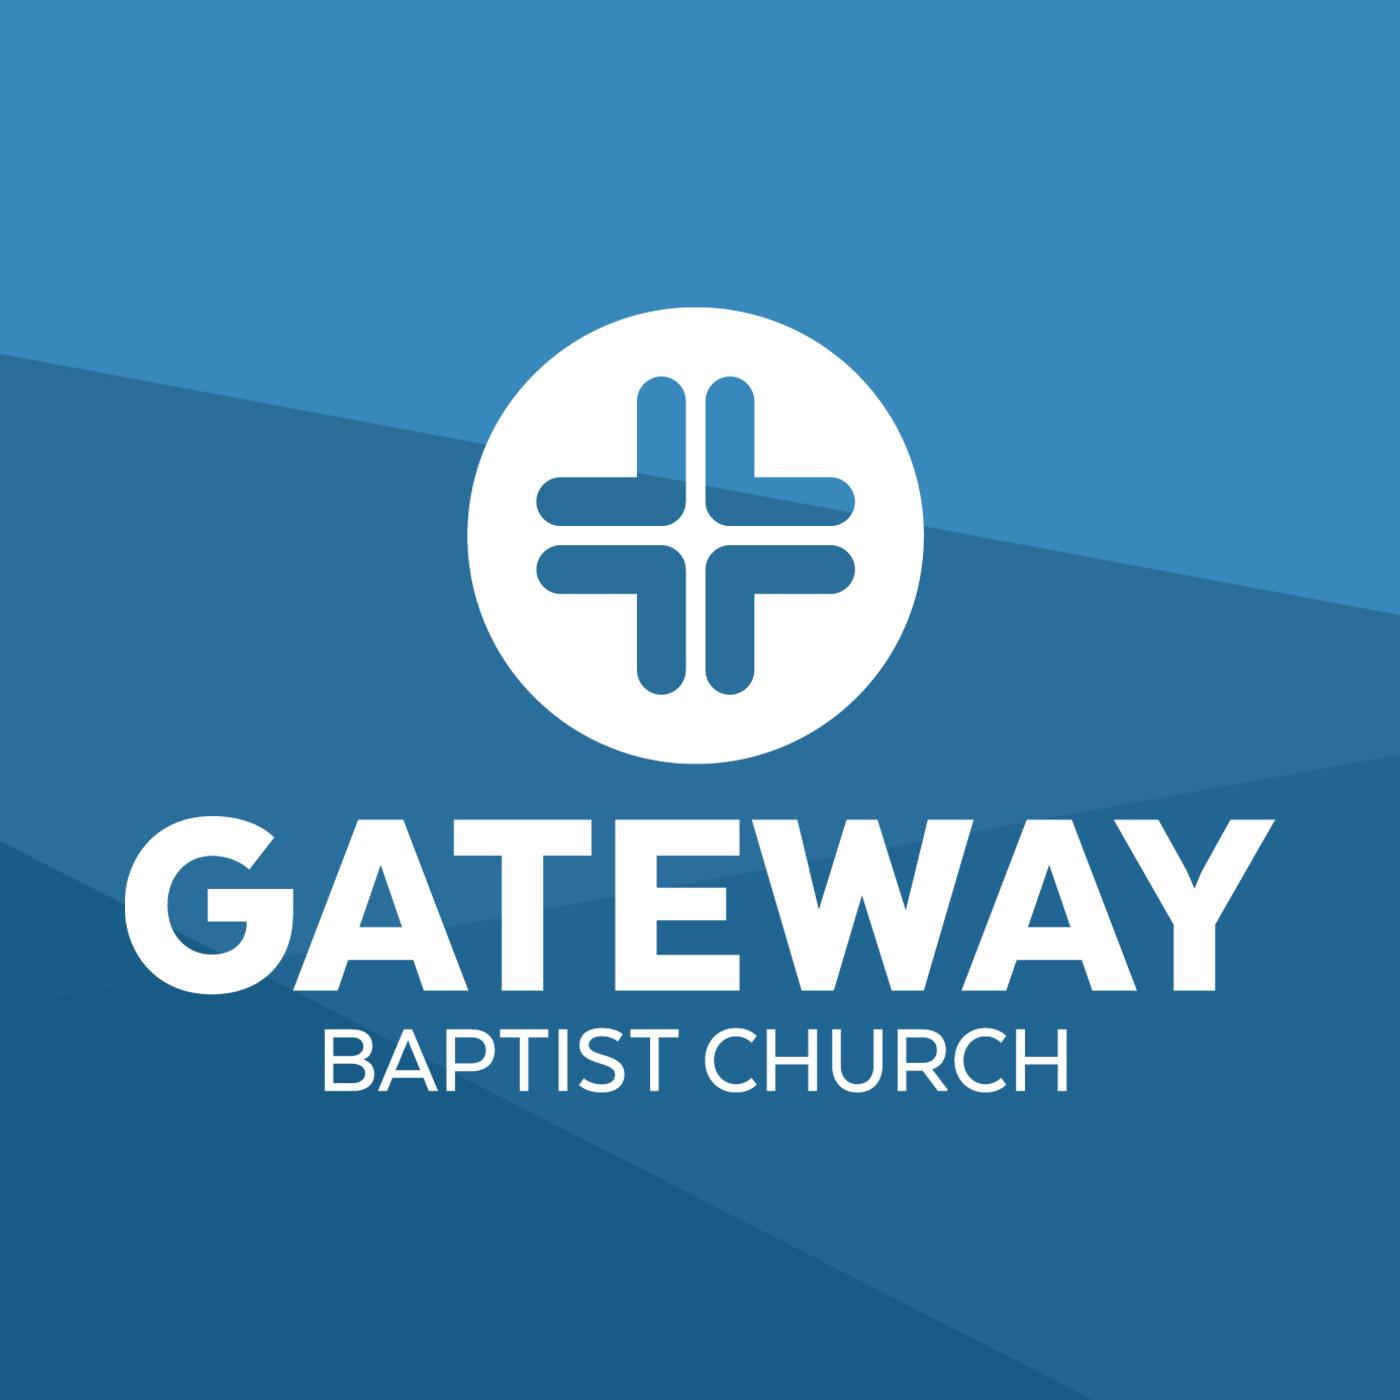 Gatewaybcsc